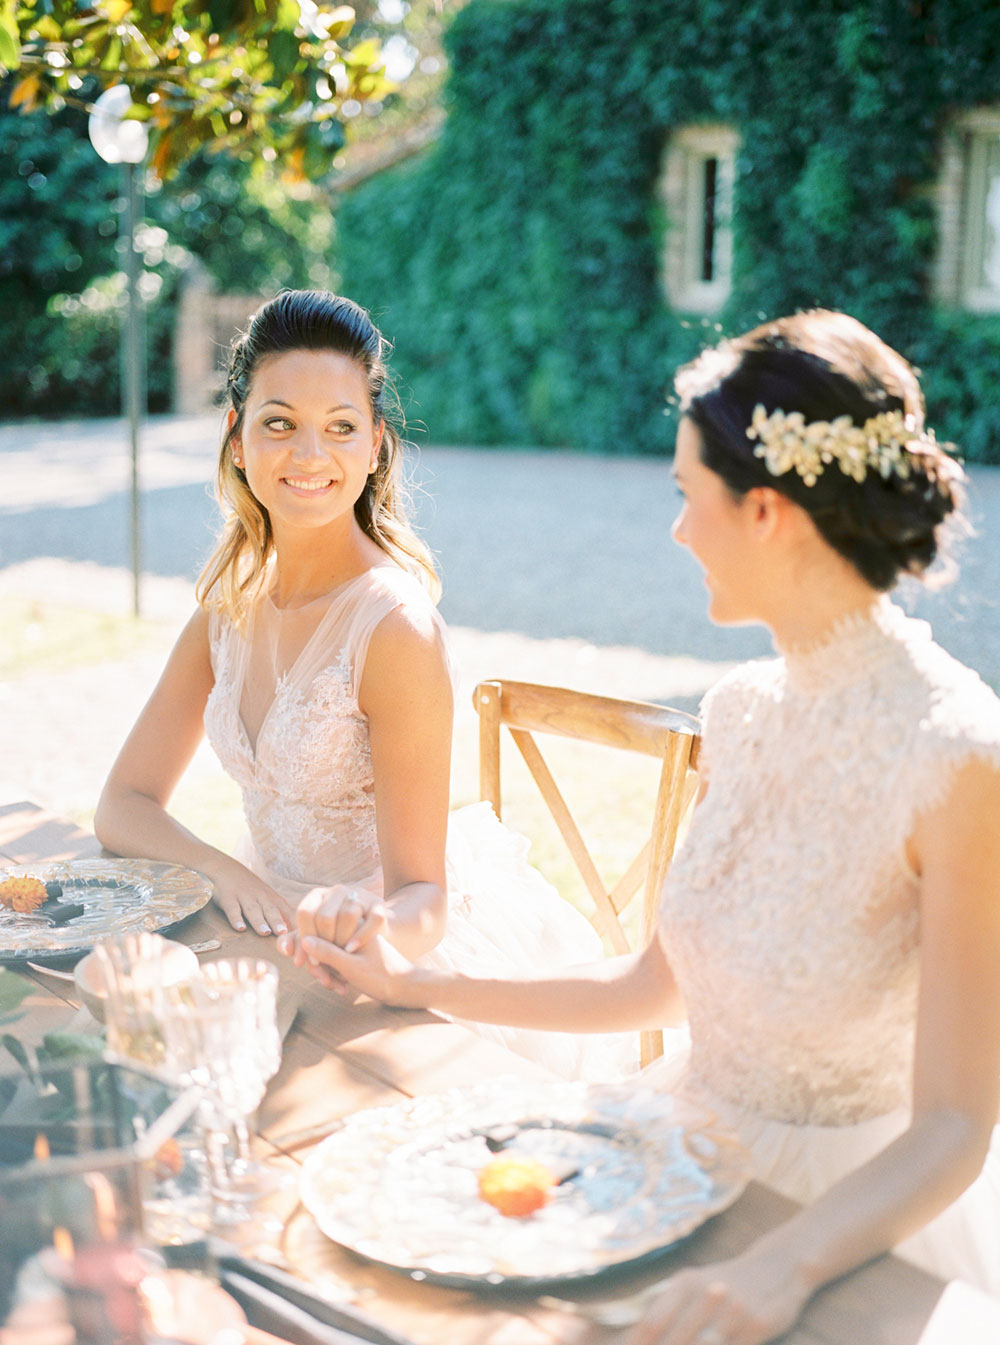 Linari-Tuscany-Elopement-Courtney-Michaela-207